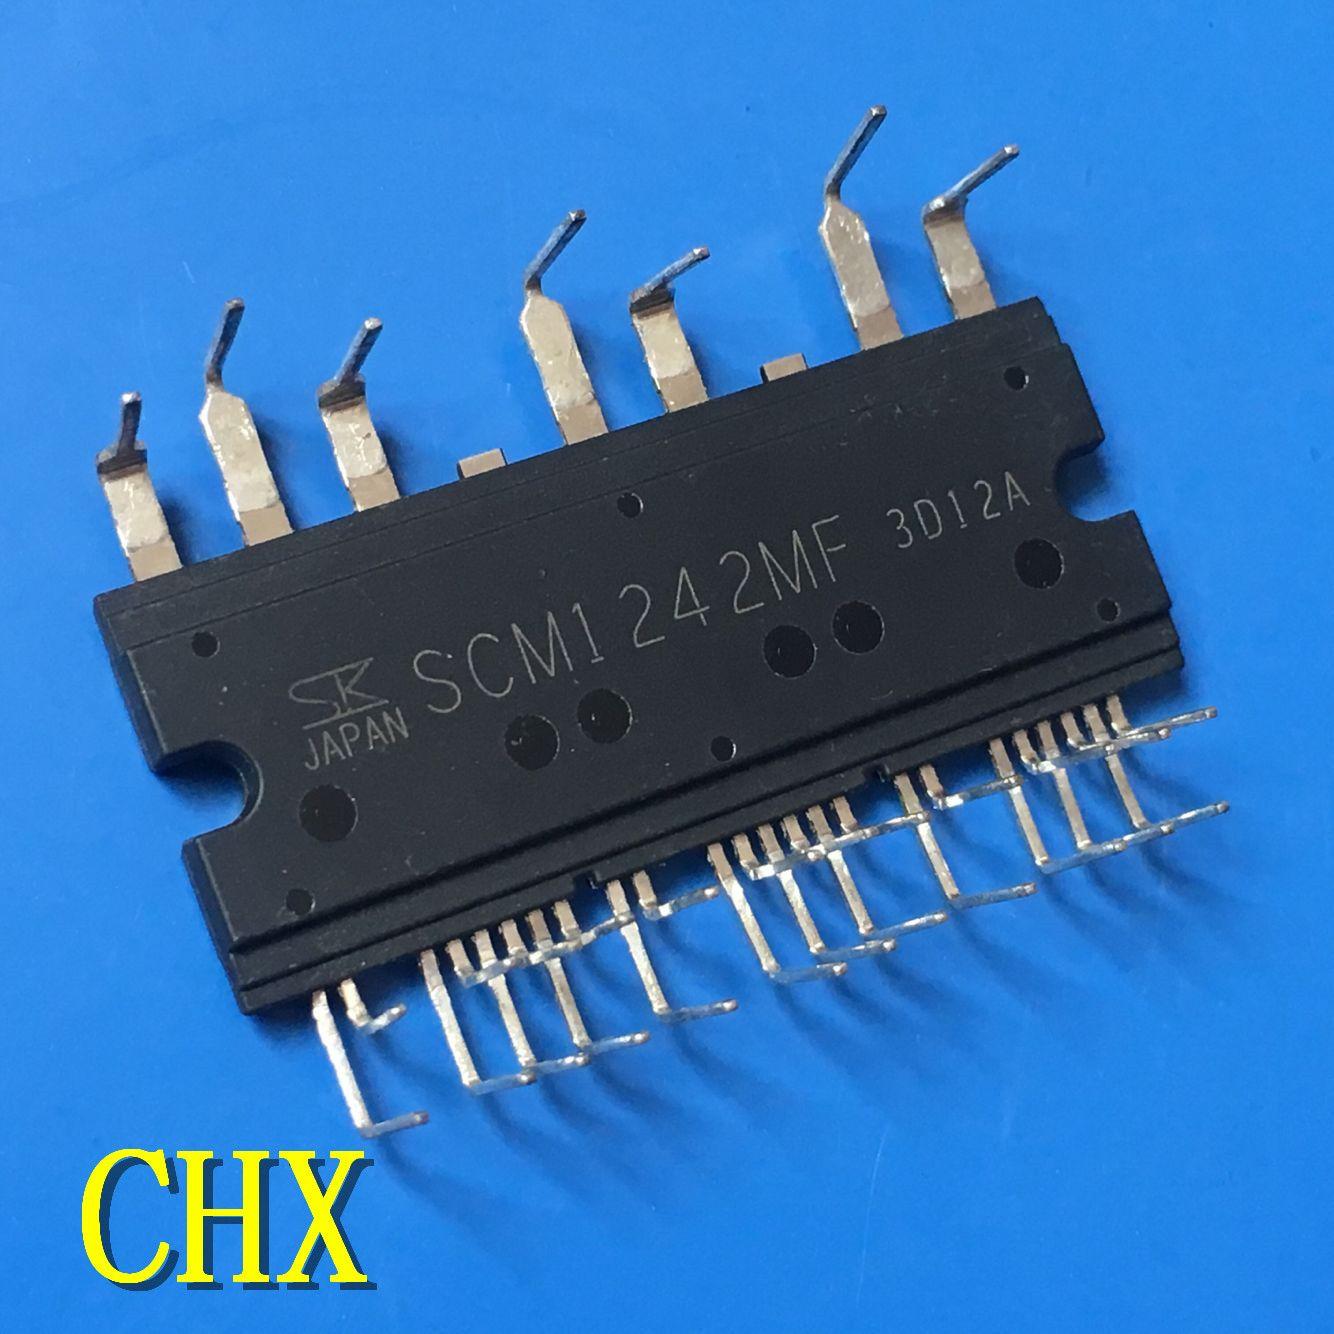 2 / PCS Neu und ursprünglich STRG5623A STK672-630A STK672-640A 30J122A GT30J122A SCM1242MF CTM8251T UPA1476H PA1476H TA1223AN DIP ZIP SOP-Modul